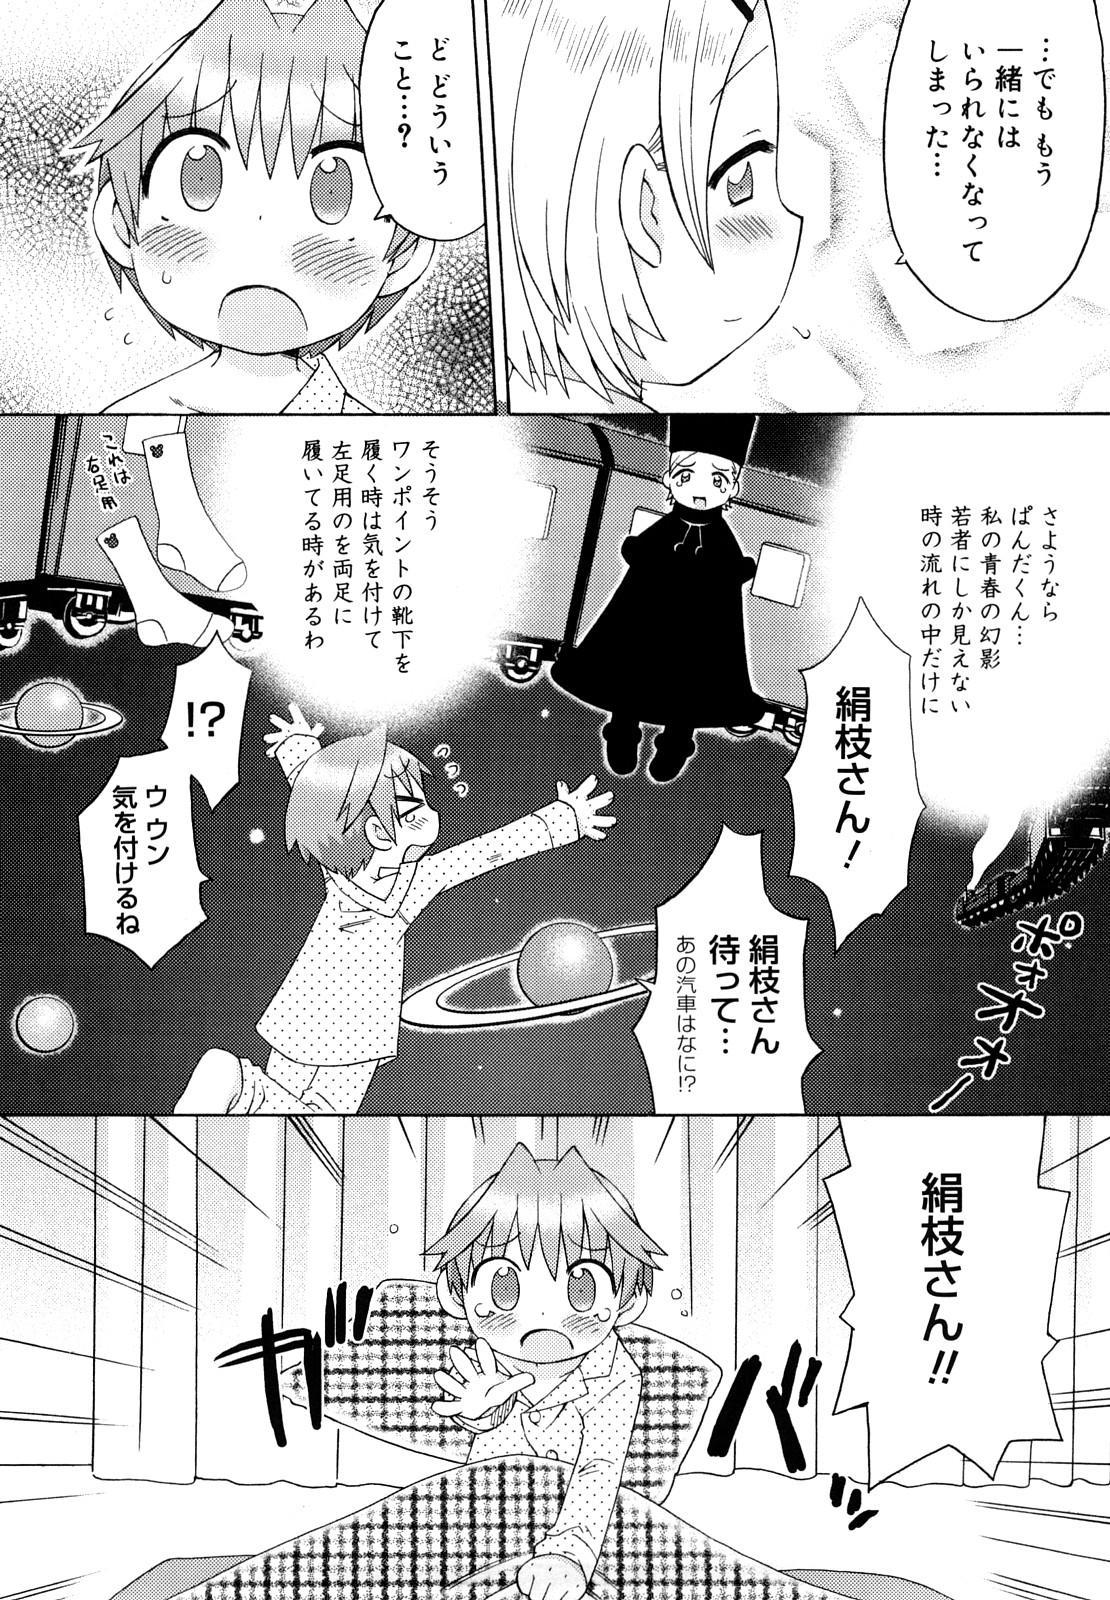 Hatsuden Pandakun! Shinsouban 172